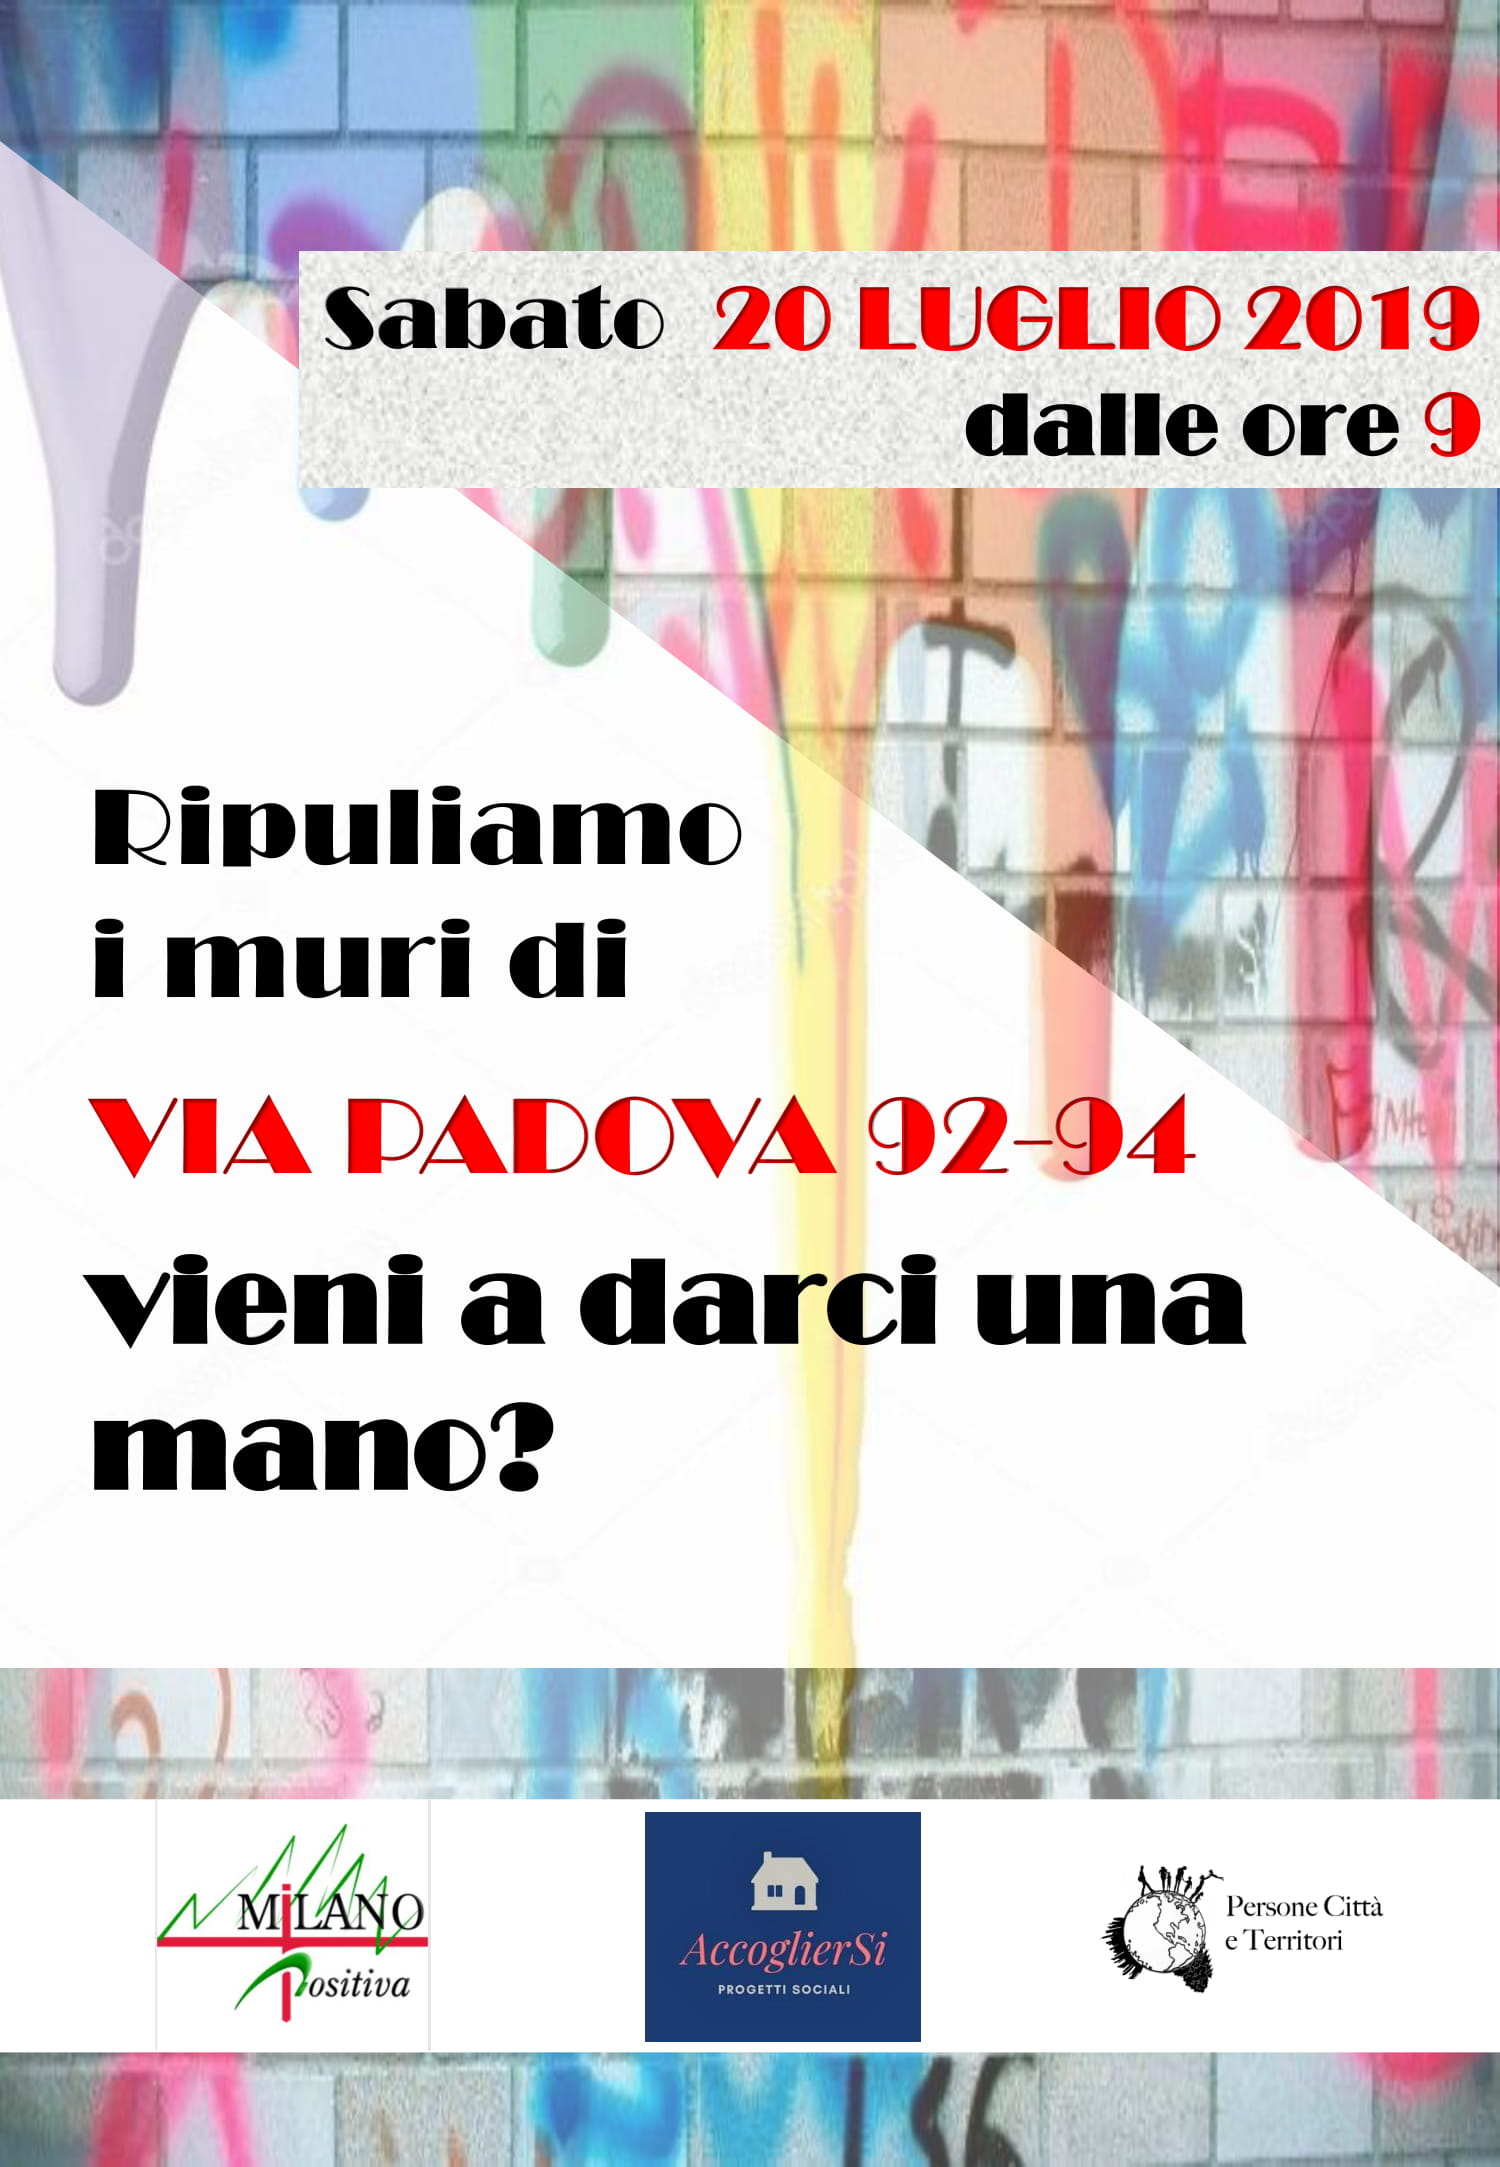 Ripuliamo i muri di Via Padova